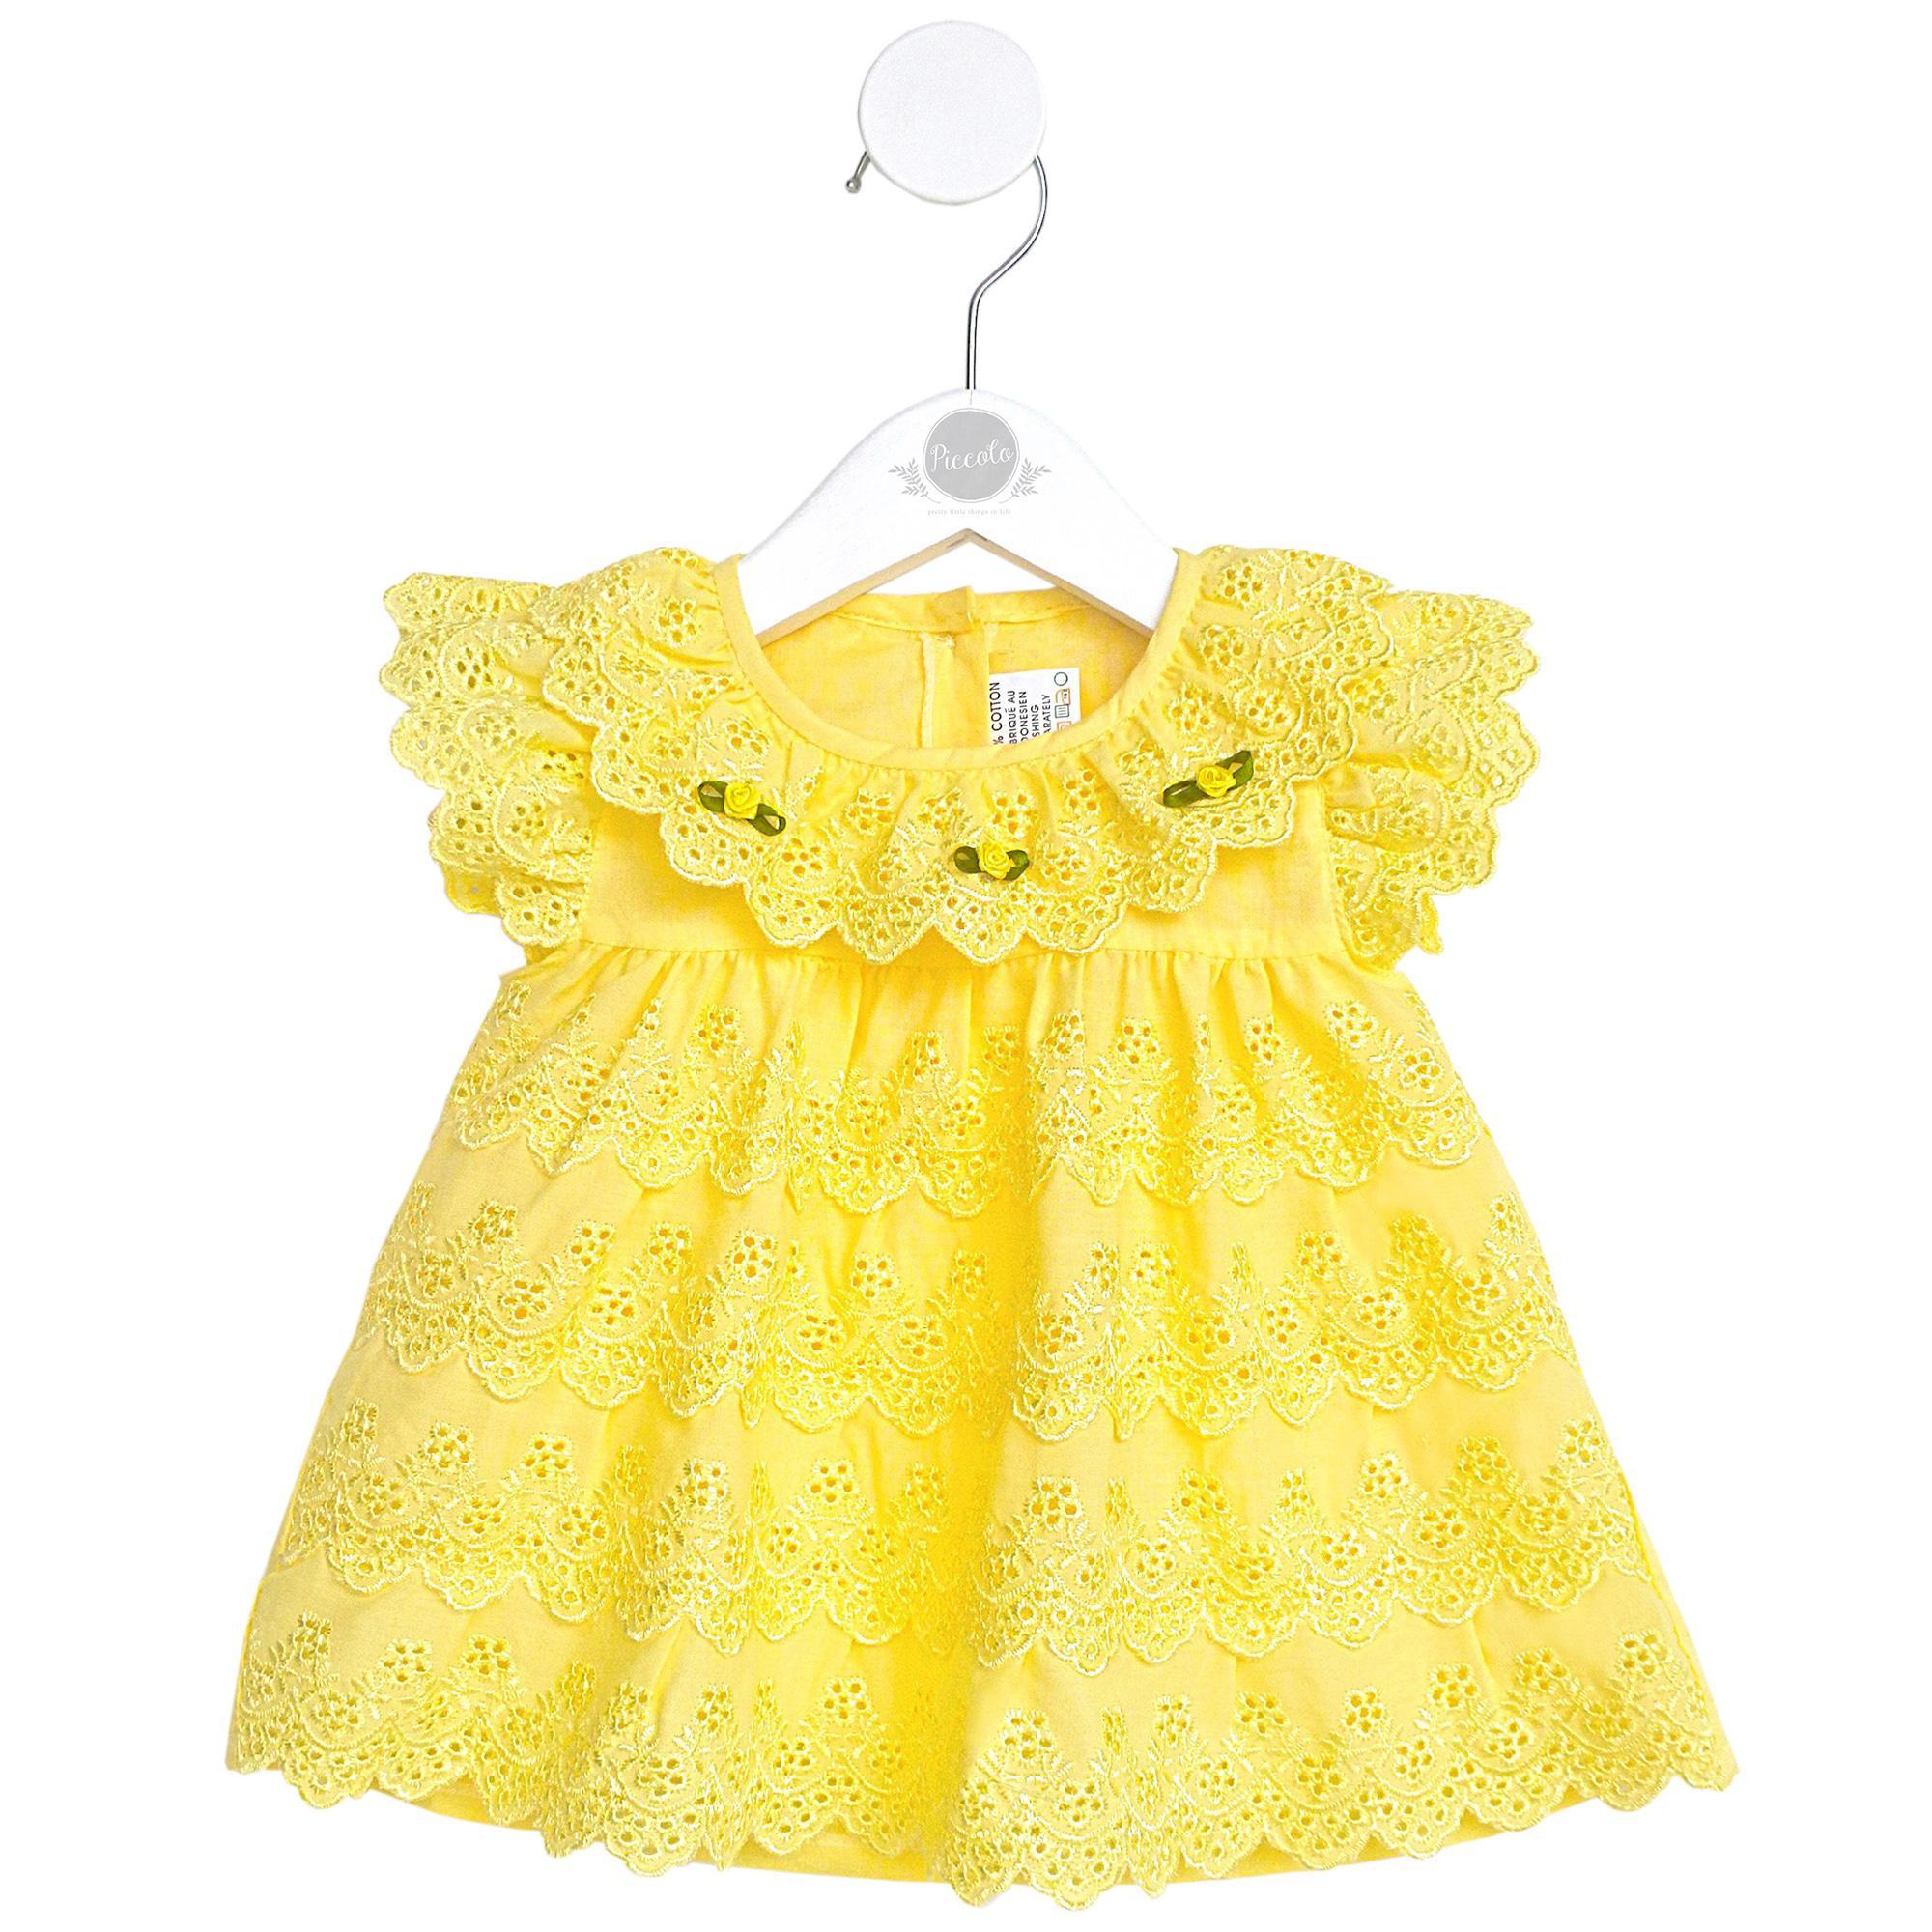 Dress Newborn New Born Baby Baju Bayi Perempuan Baru Lahir Warna Kuning NC05Y